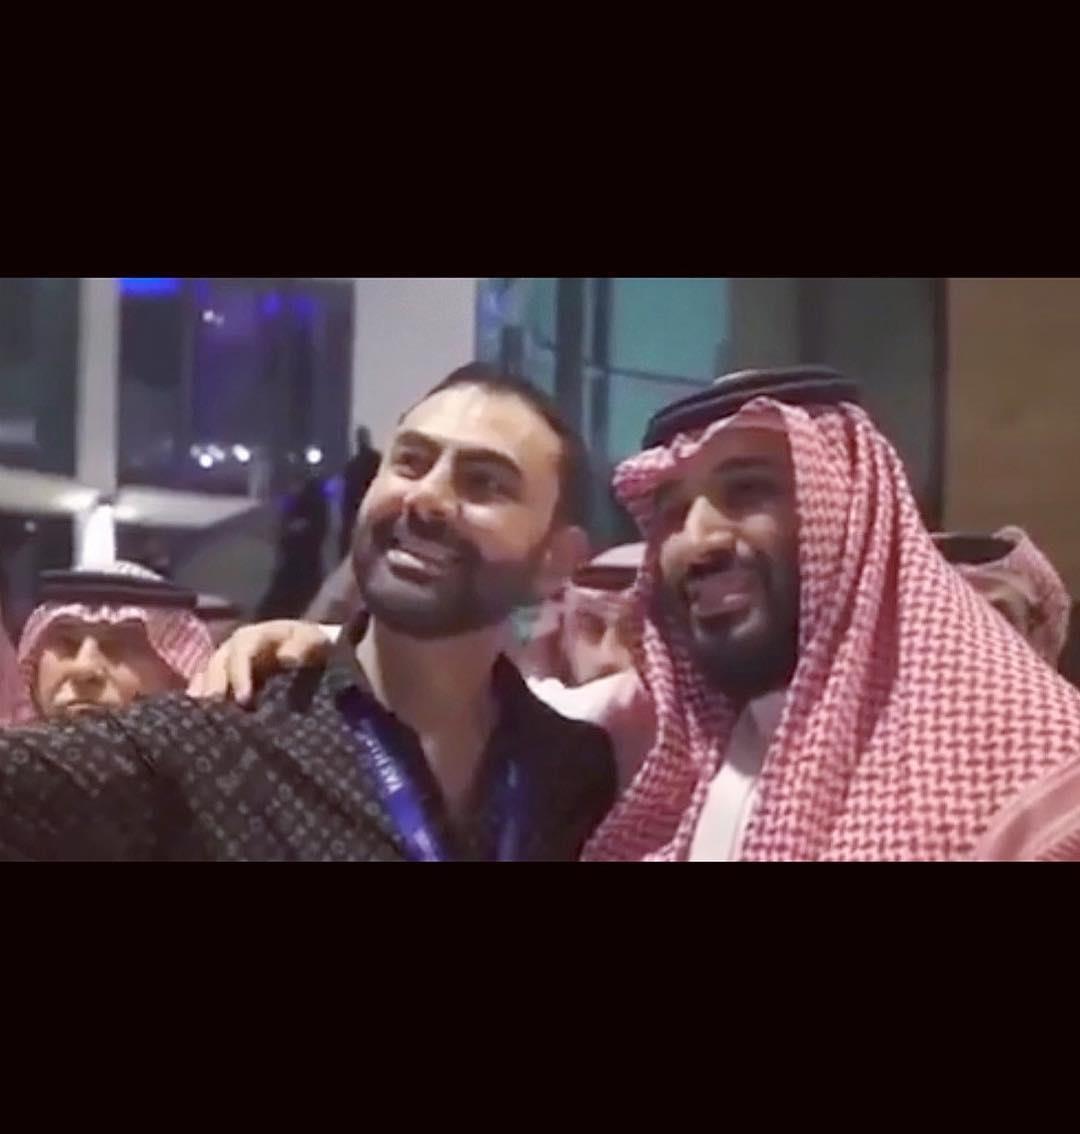 محمد كريم ومحمد بن سلمان